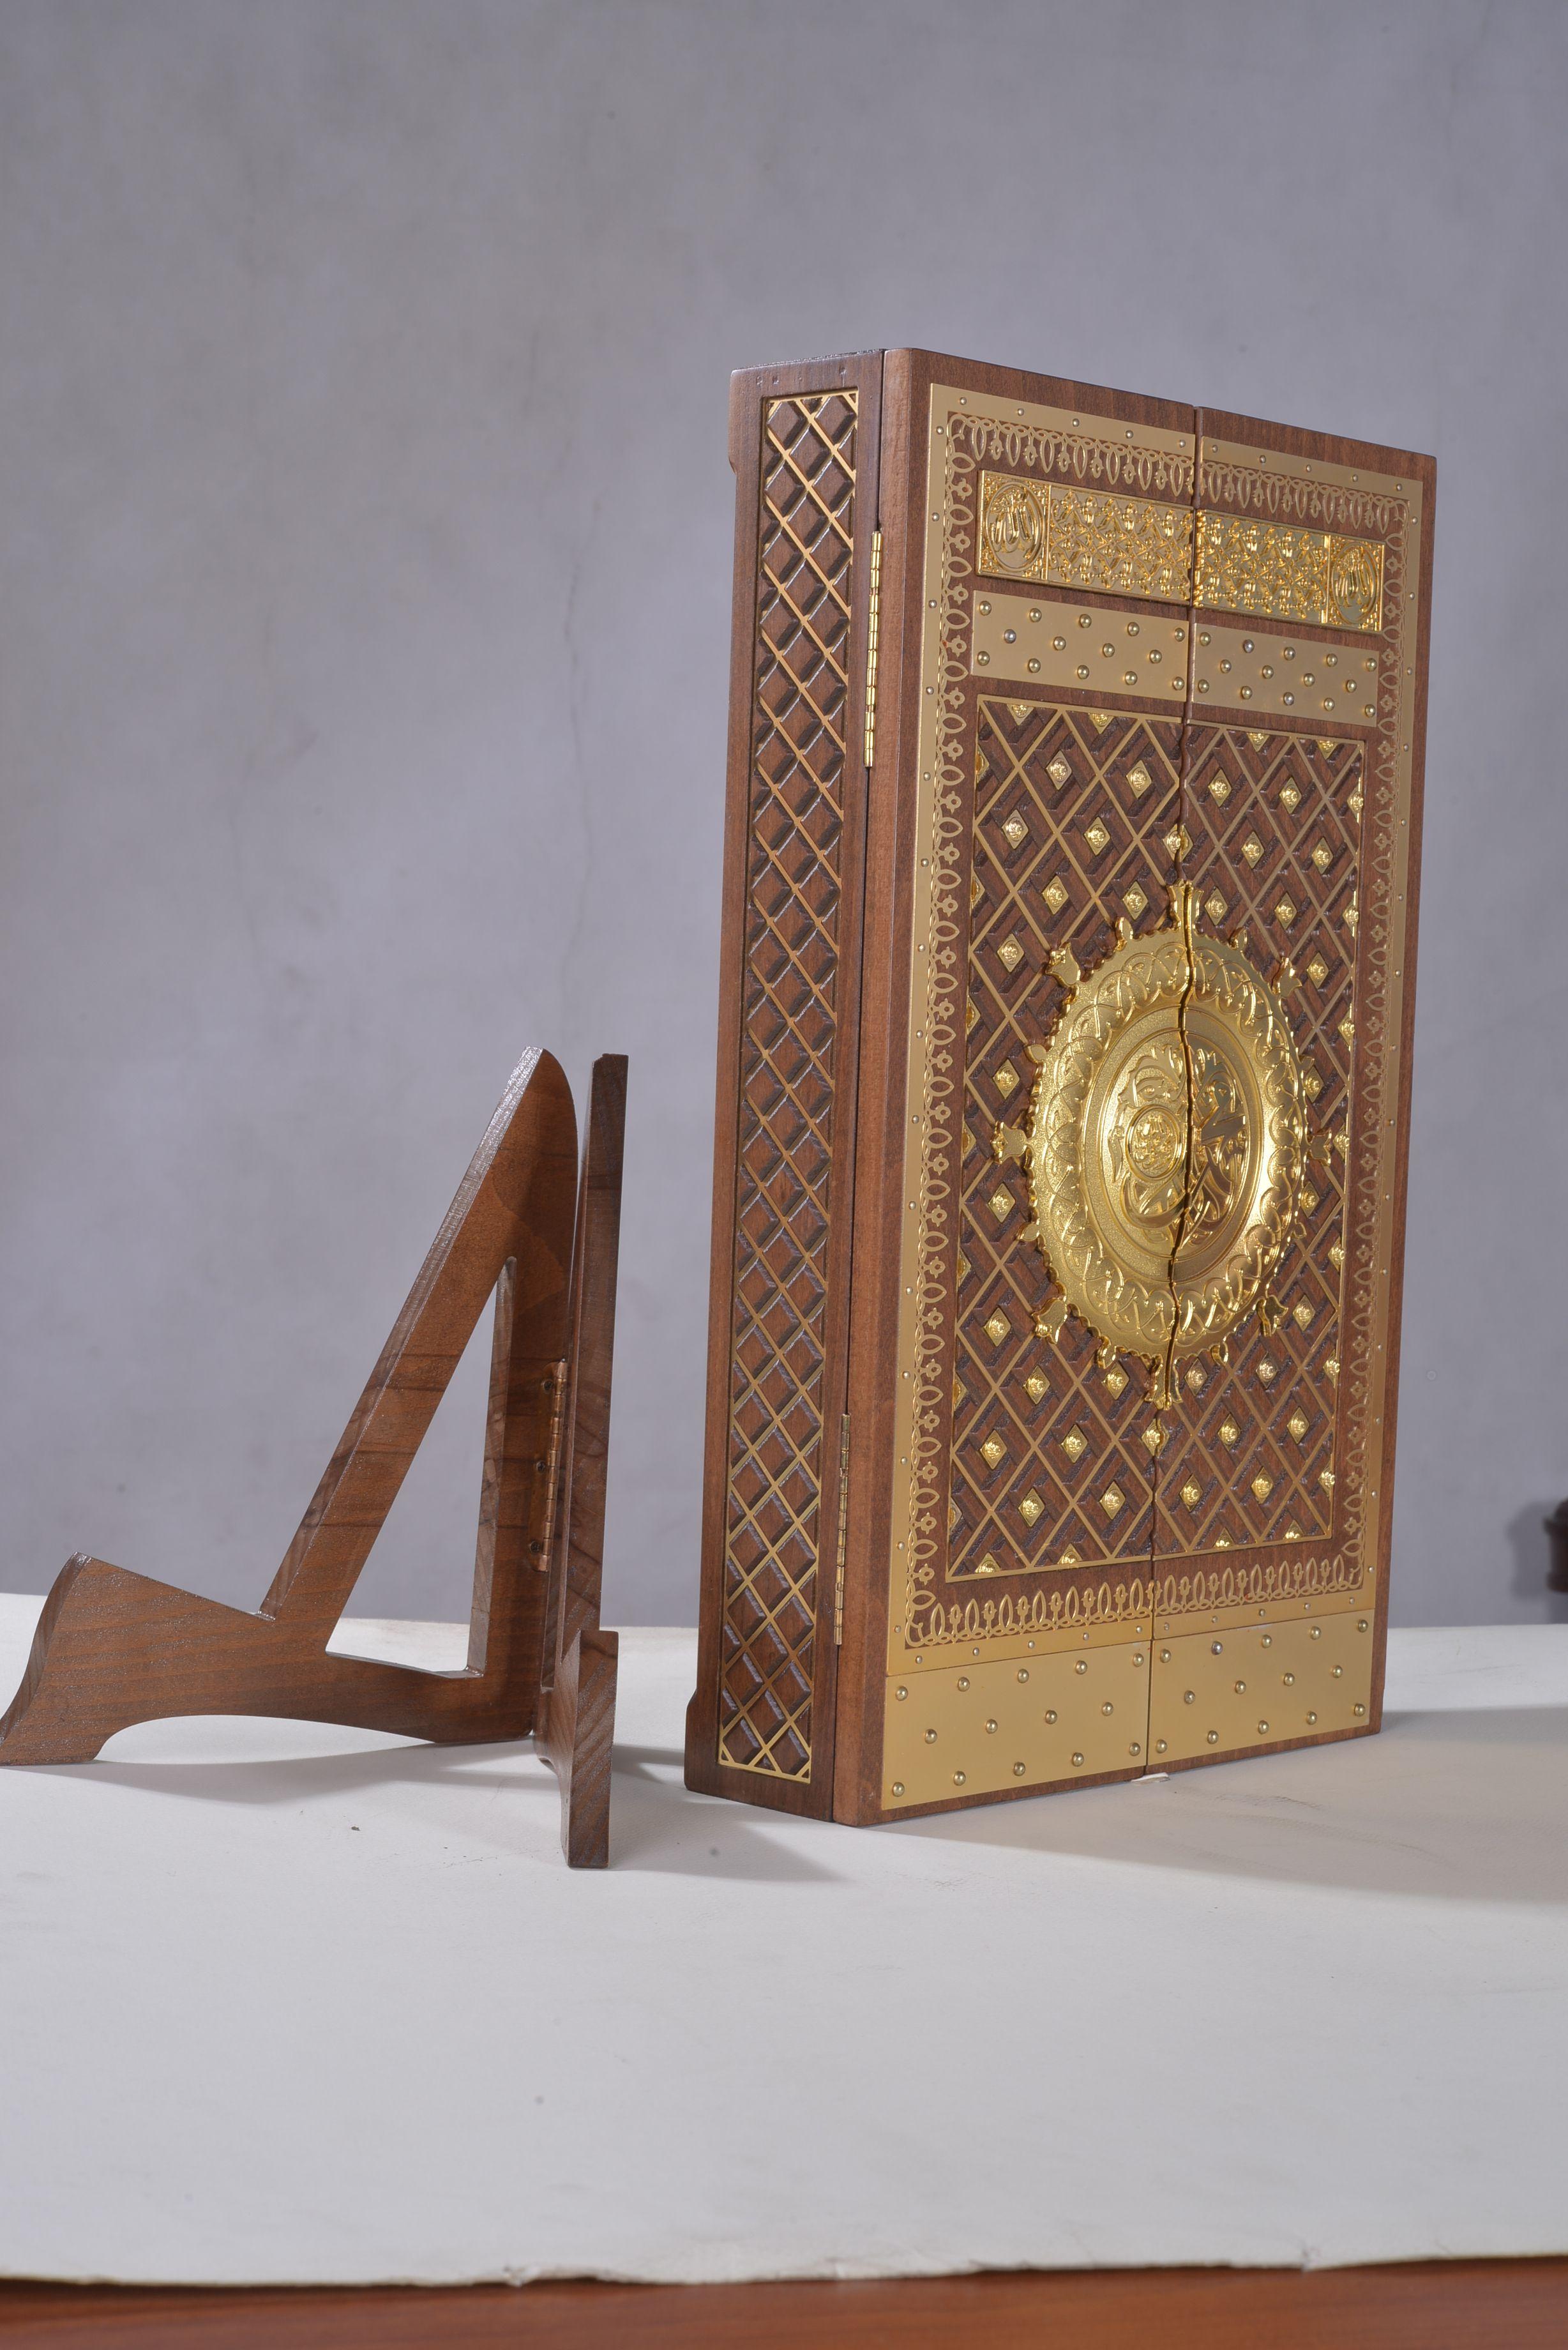 Door Of The Madina Al Mnorah بــاب المسجـد النبــوي الشريــف المــدينــة المنــورة Home Decor Decor Bookends